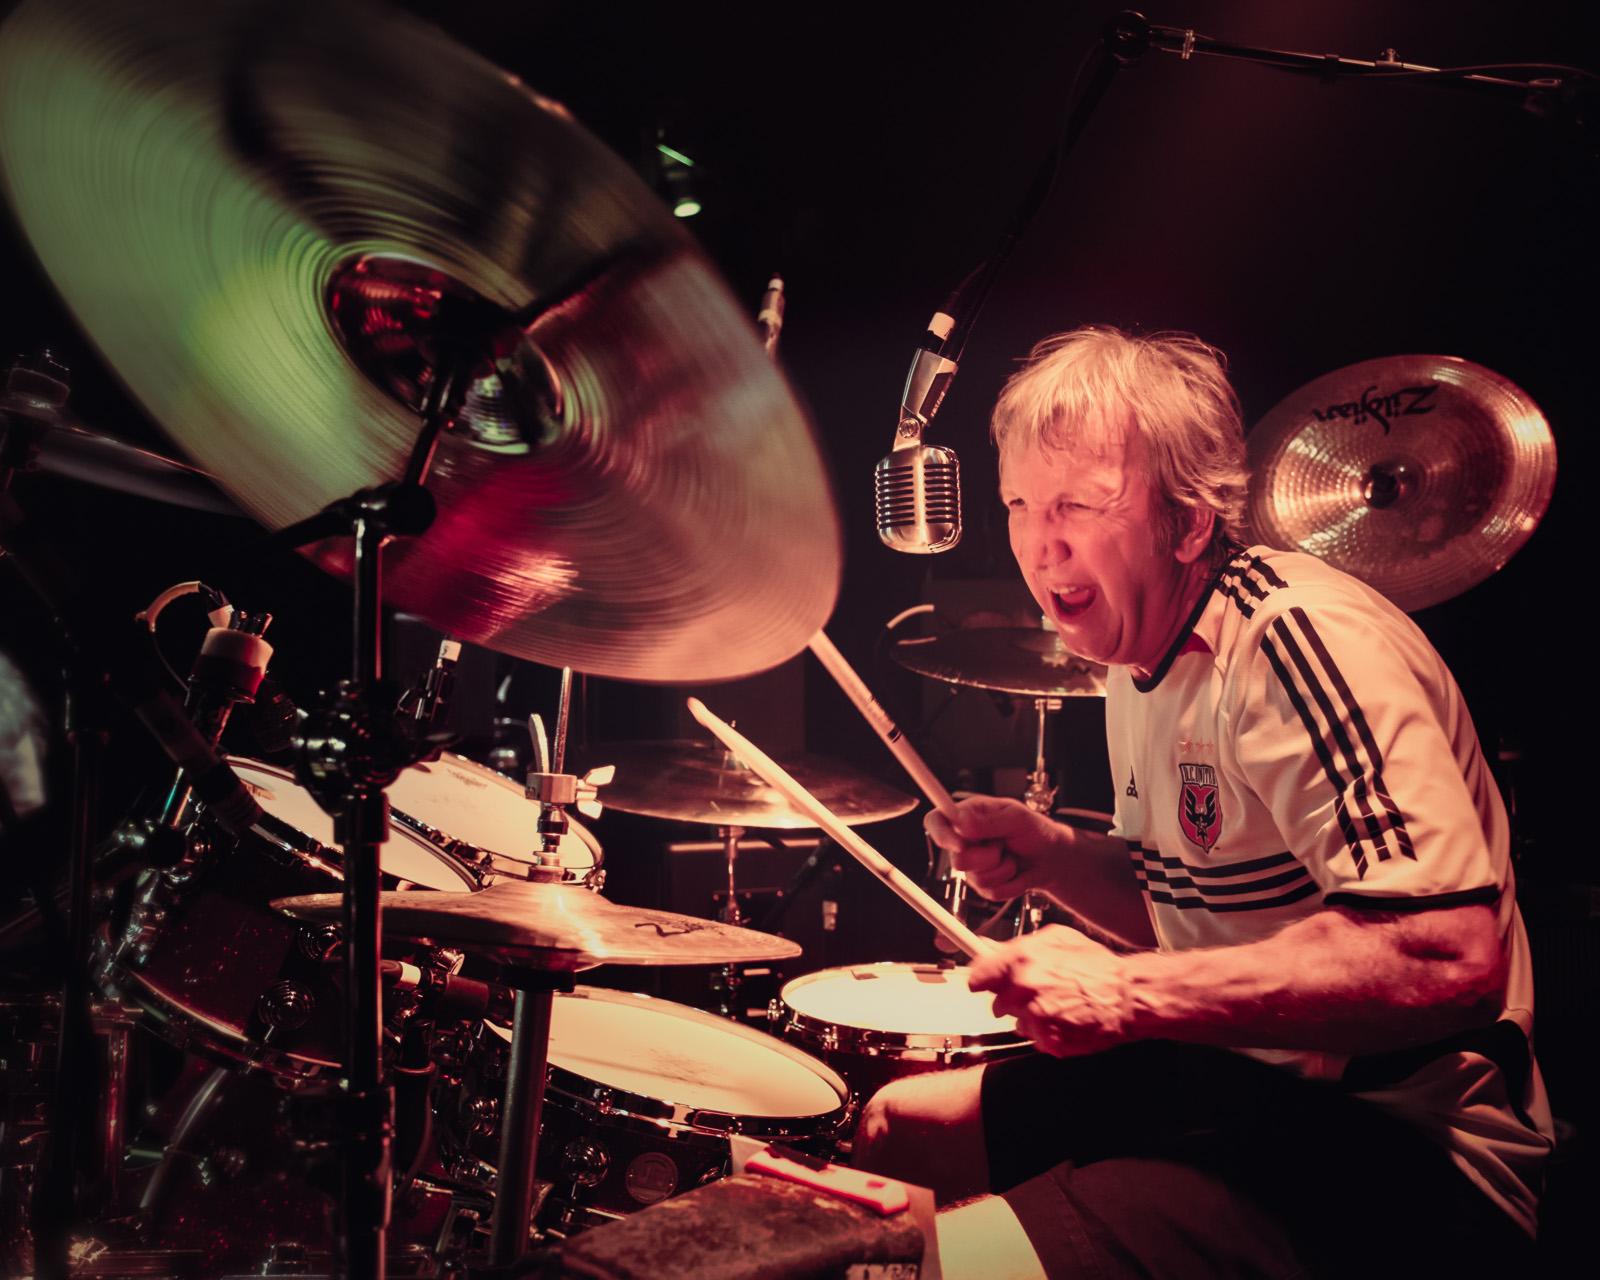 Driver Band drummer Howard Woodall